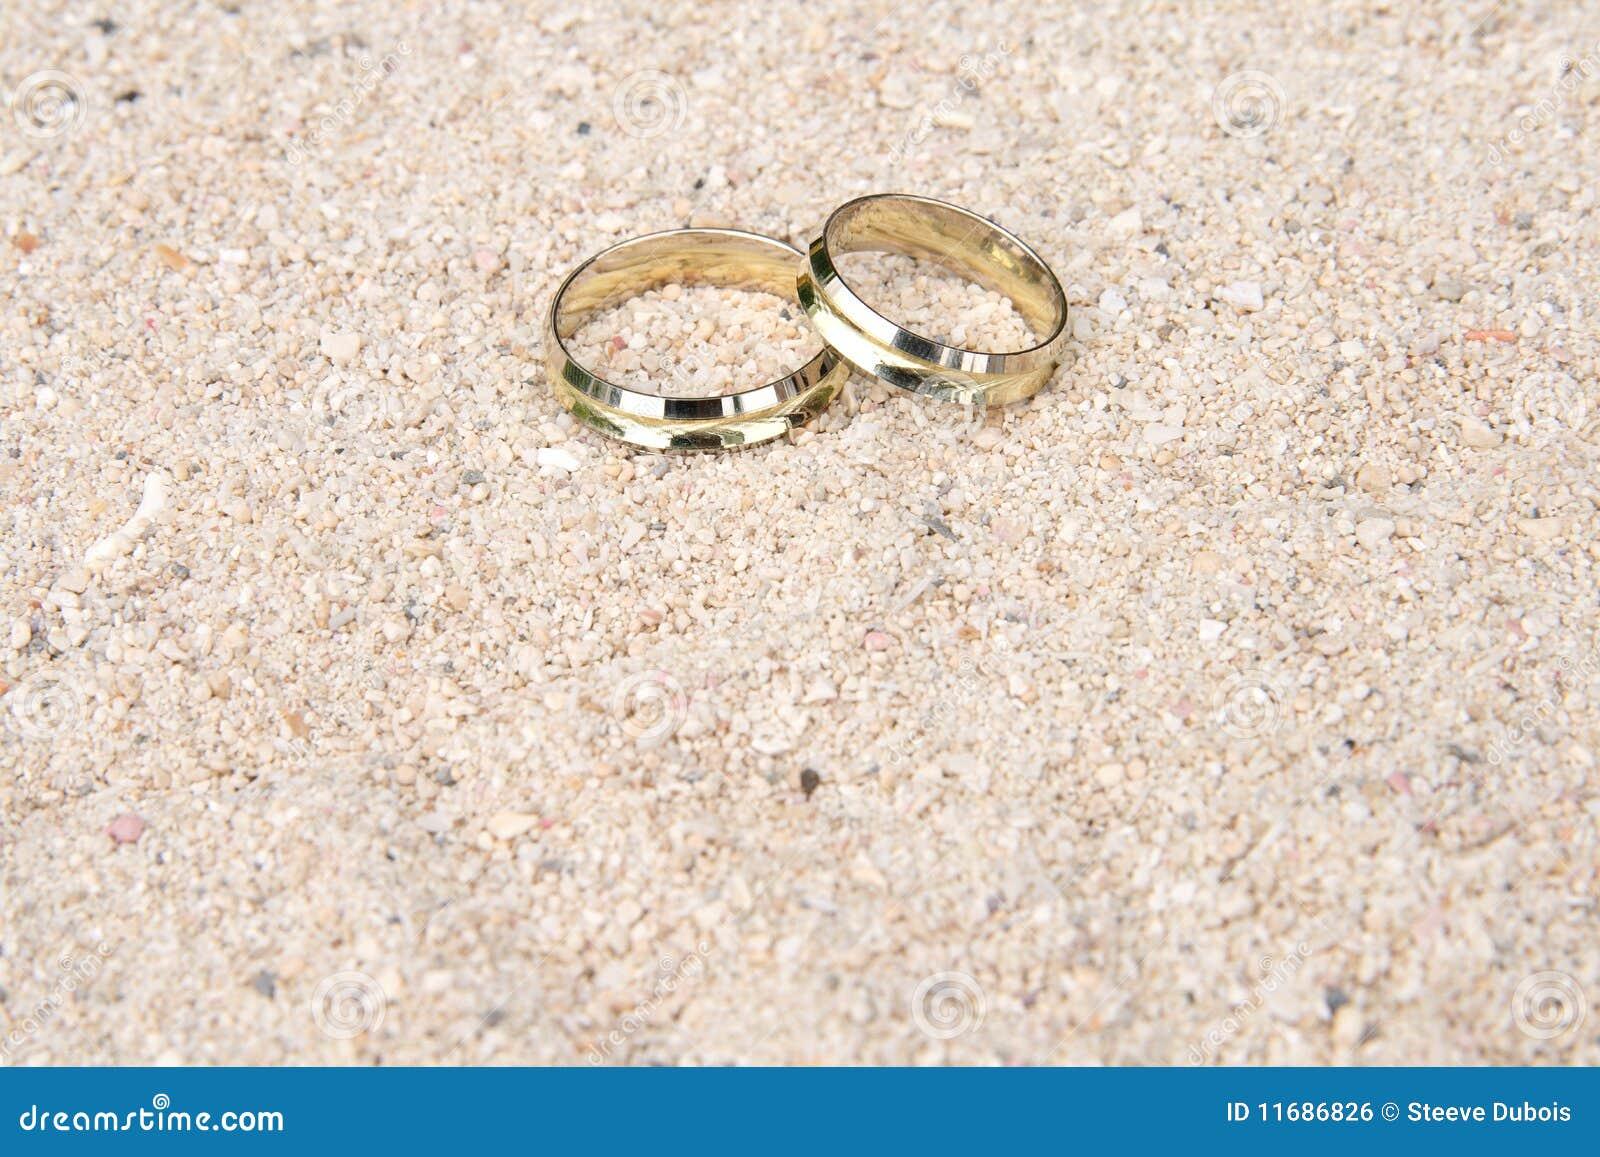 Beach Wedding Rings 74 Cute Tropical wedding rings